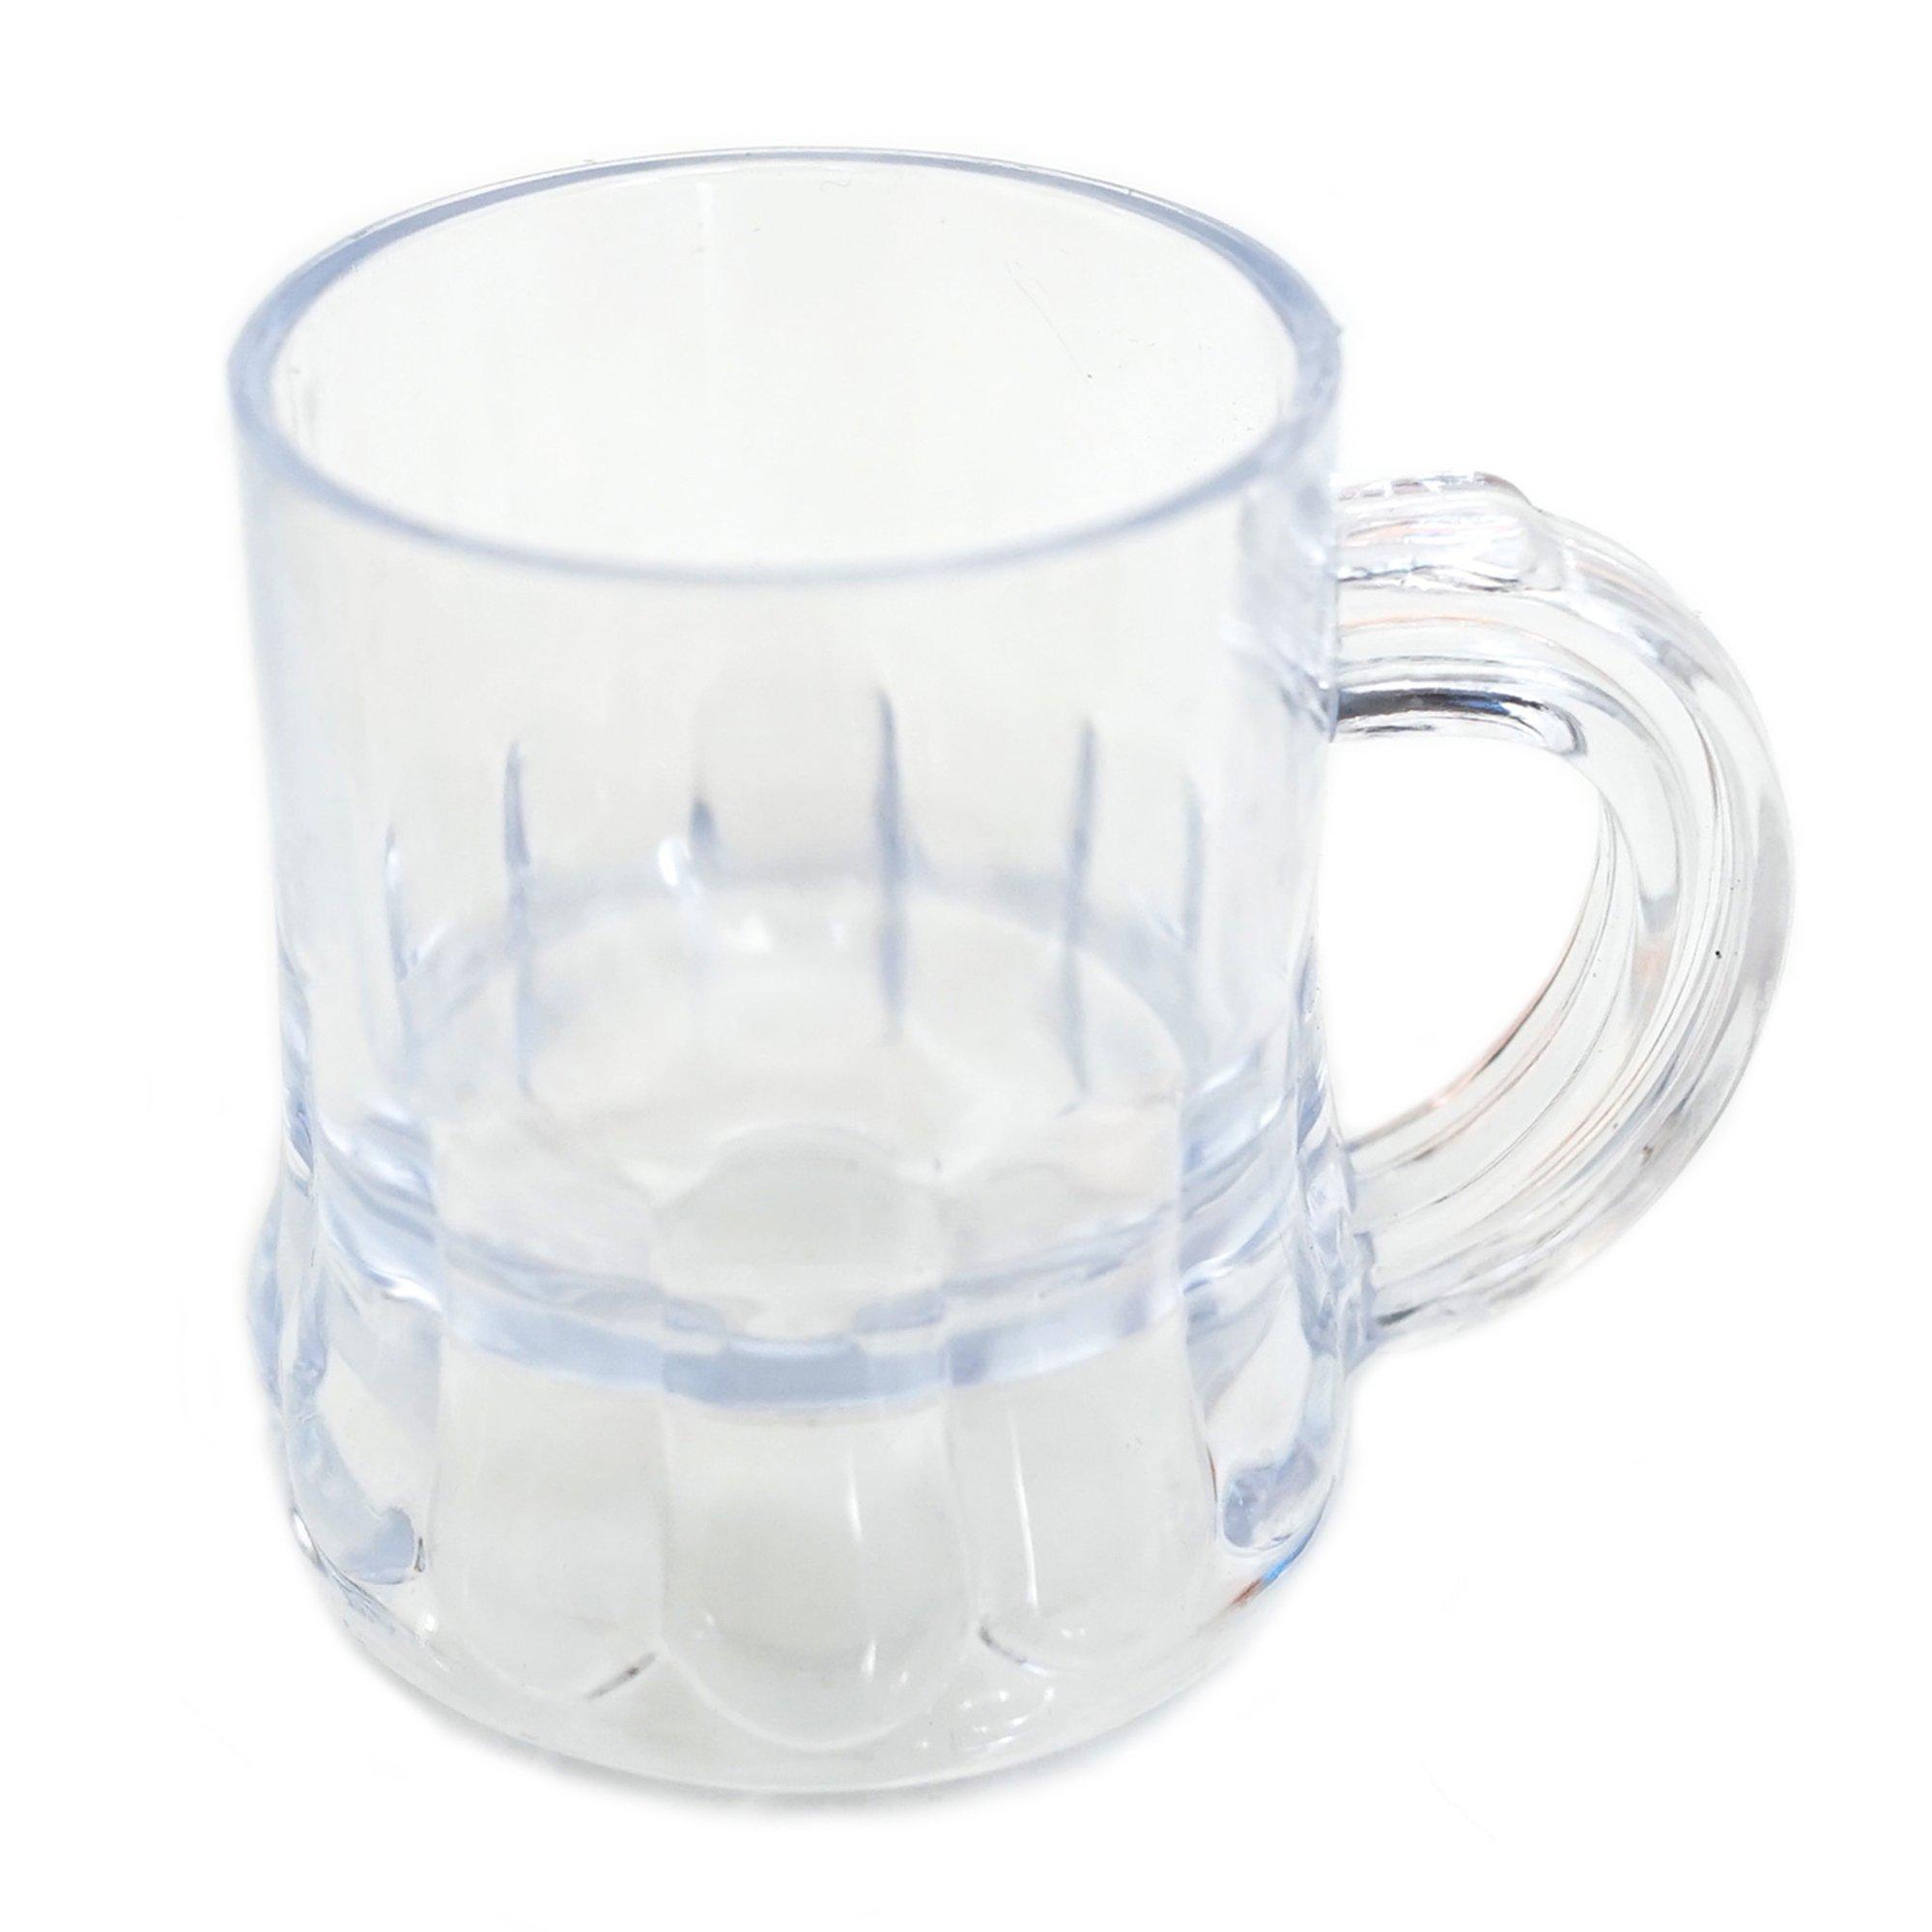 Mini Clear Plastic Beer Mug Shot Glasses- 1.75'' Tall (72 Count)